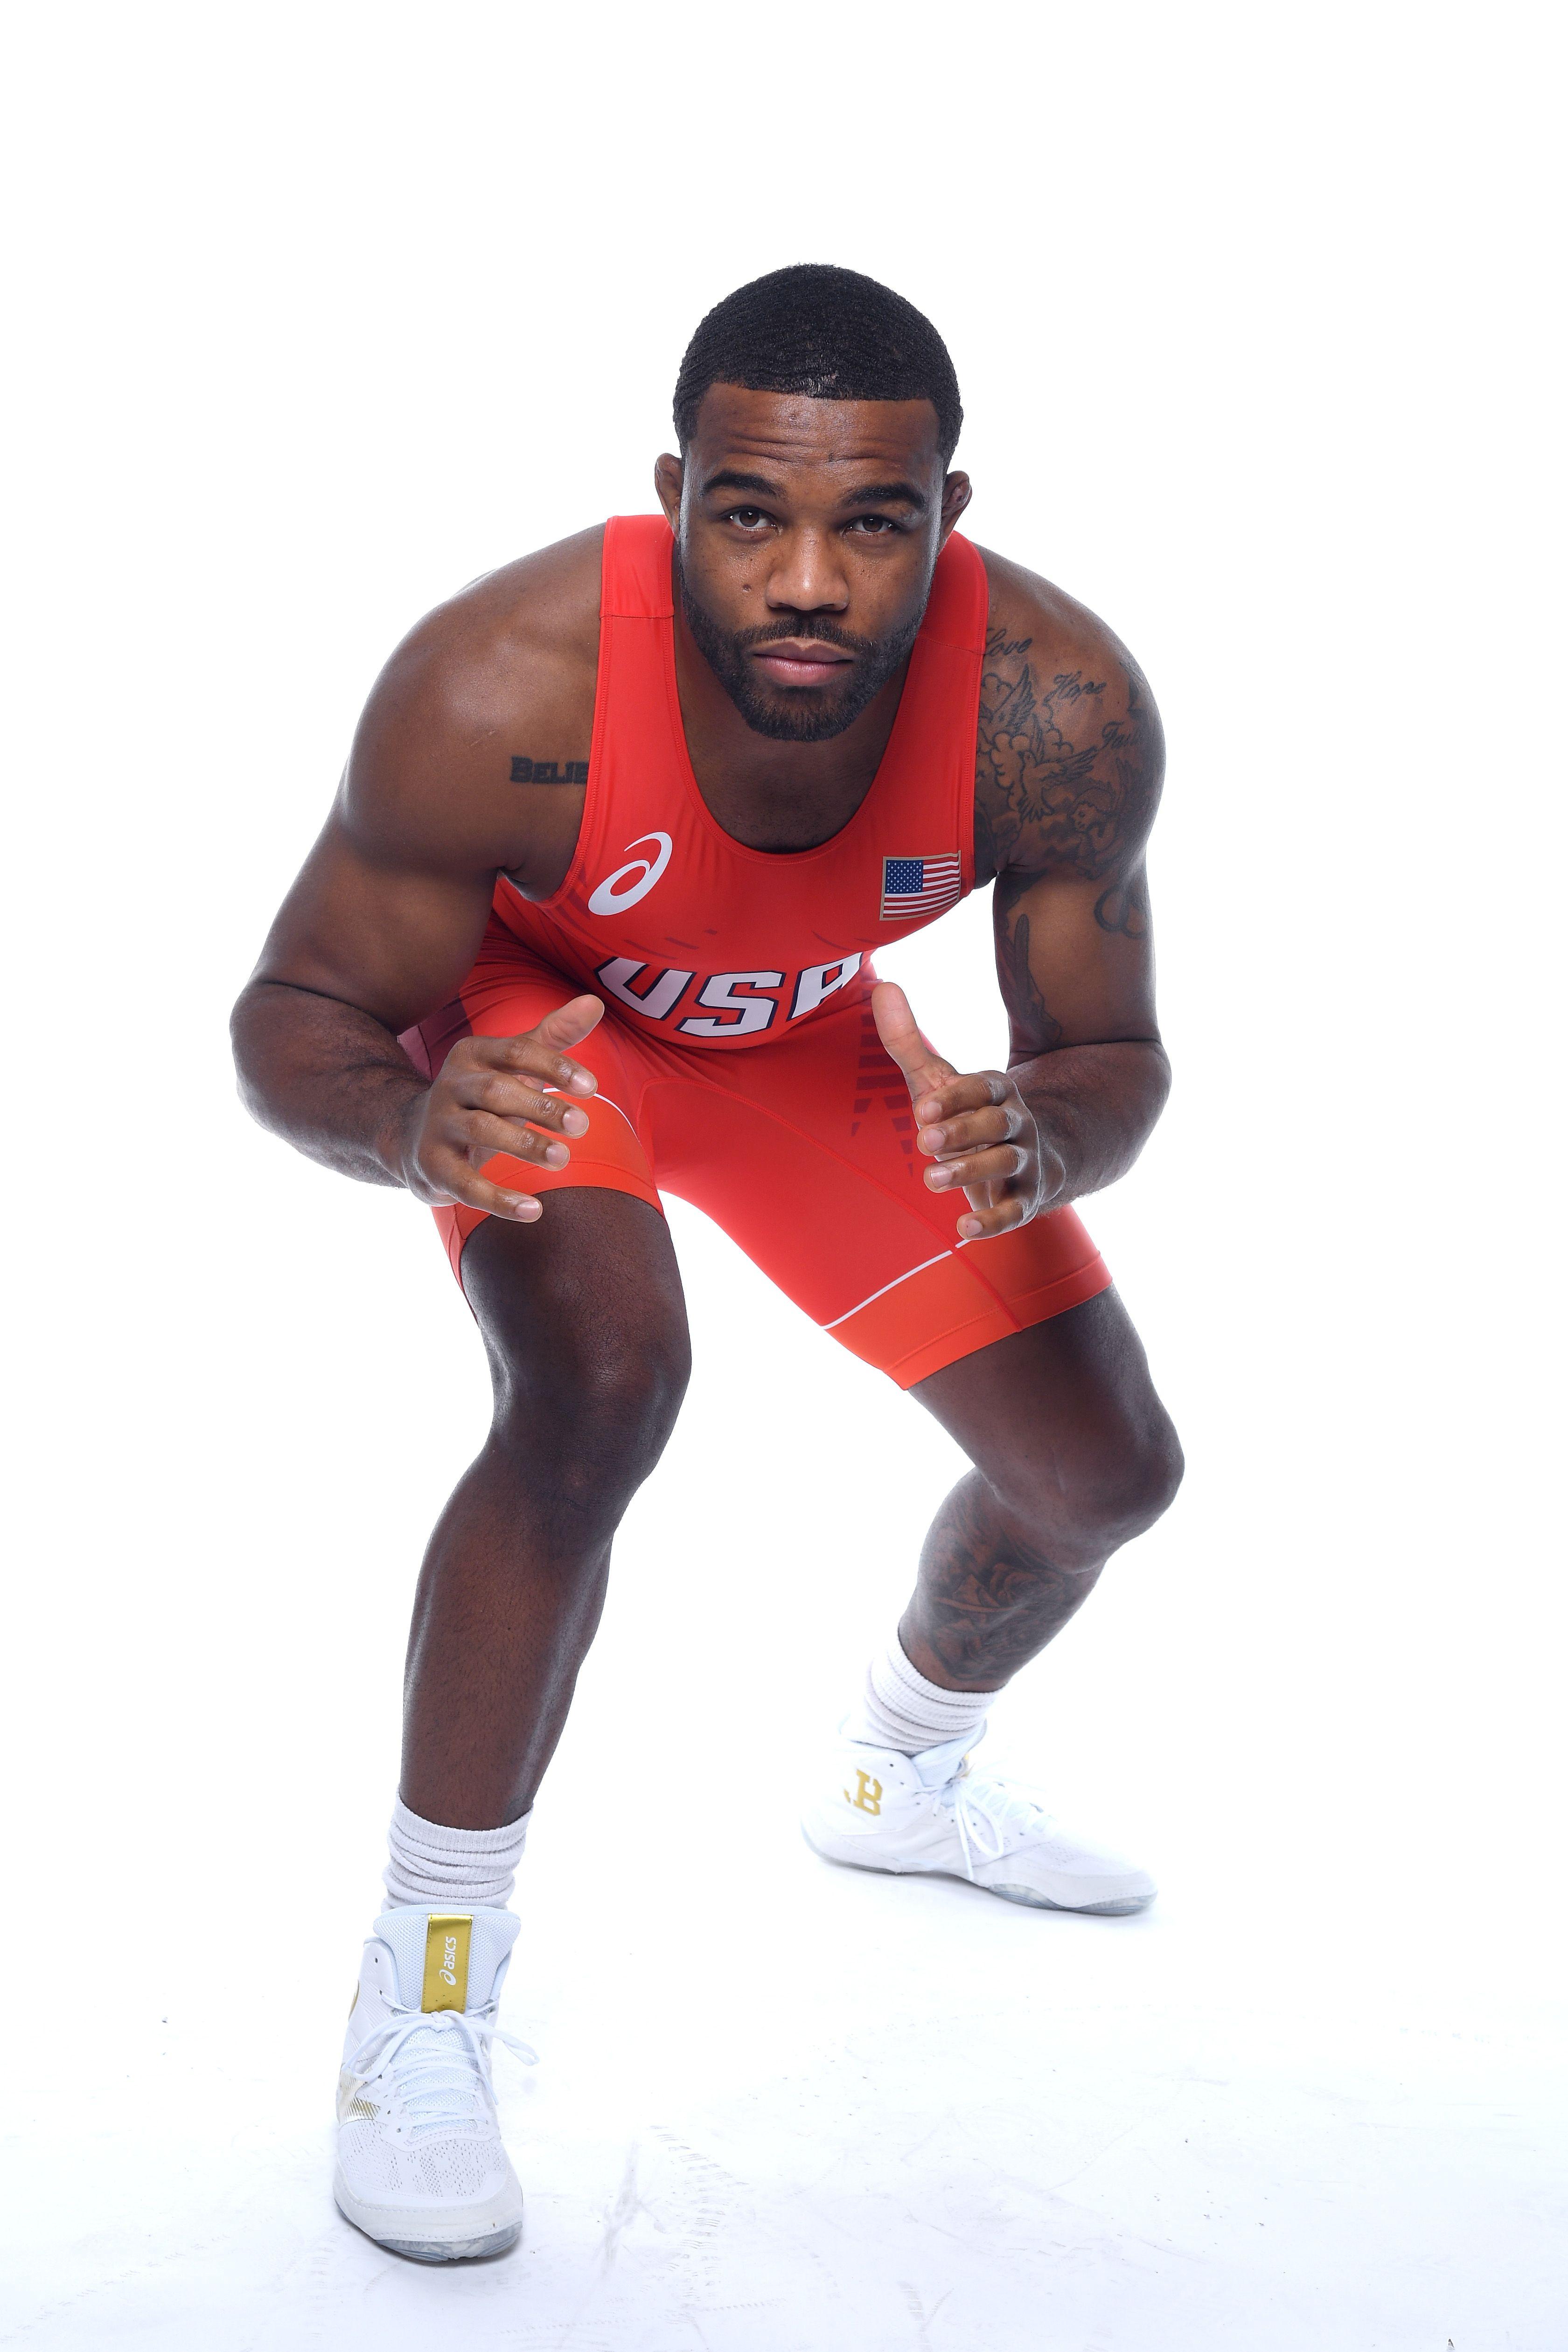 Olympic Gold Medal Wrestler Jordan Burroughs Shares His Workout